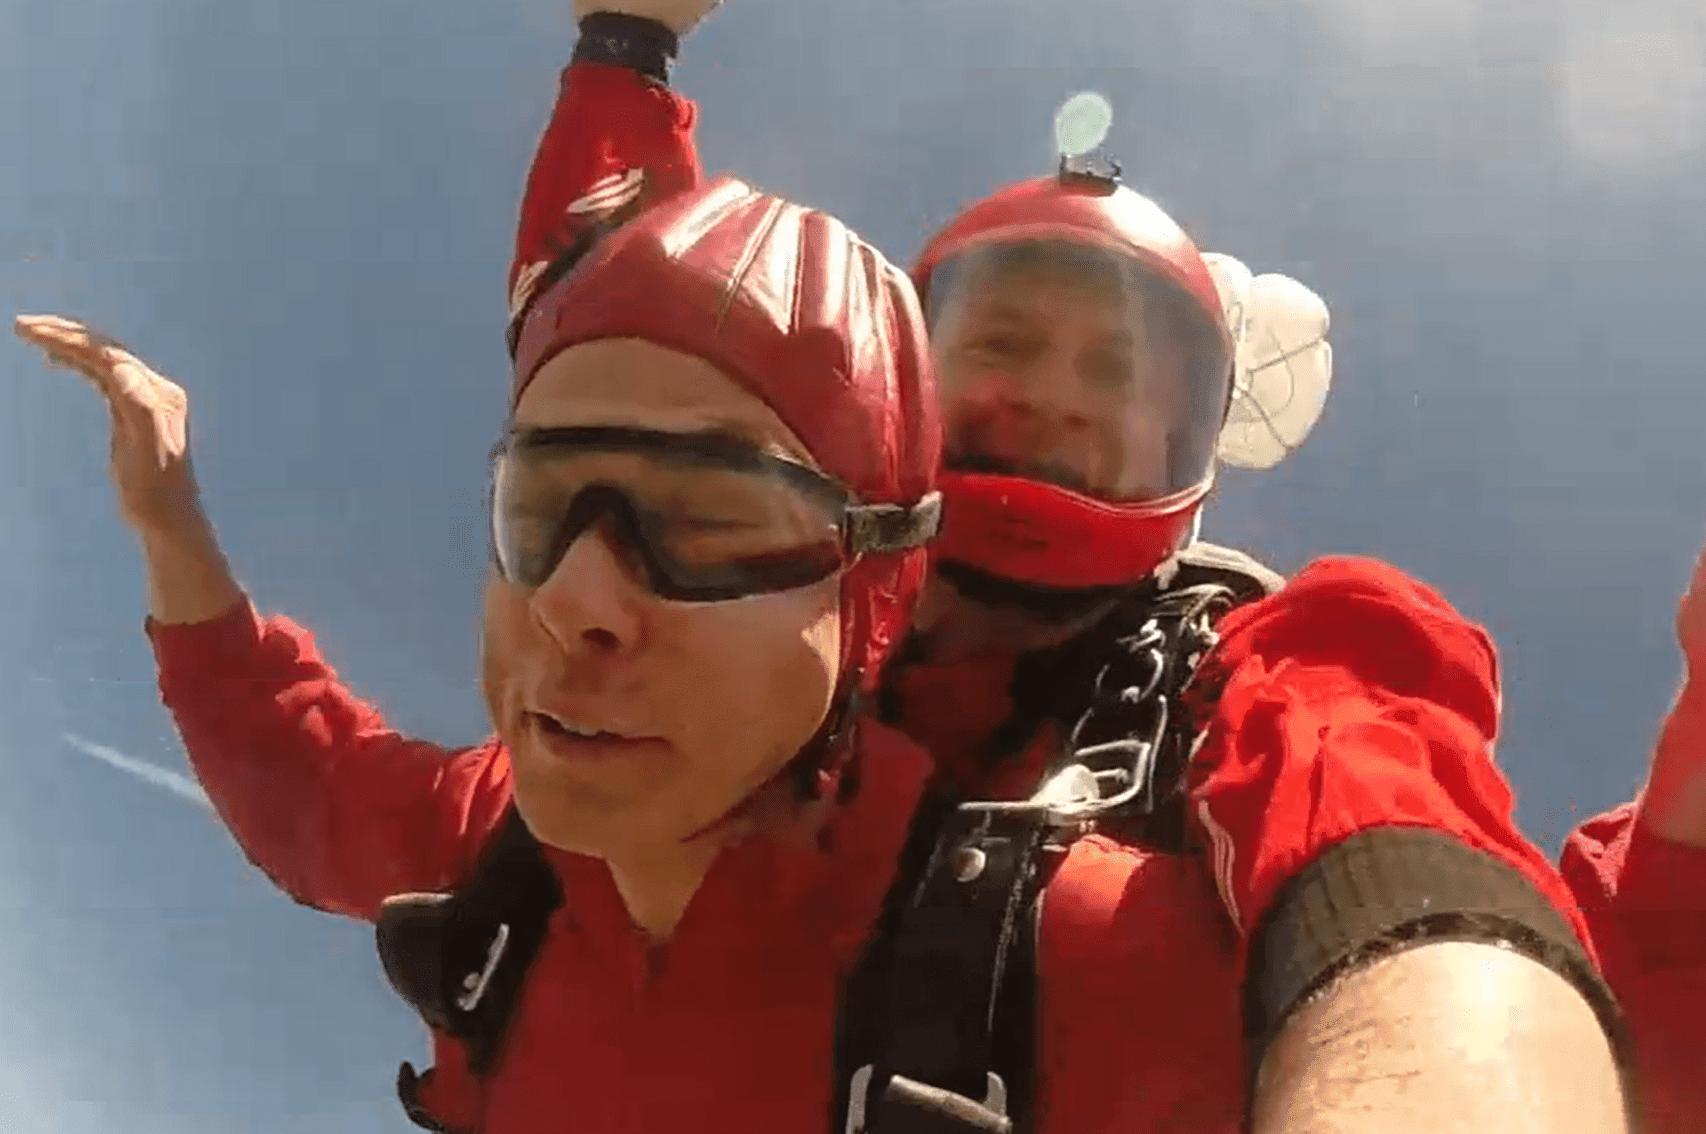 Bayern Fallschirm Tandemsprung Kunde Altdorf